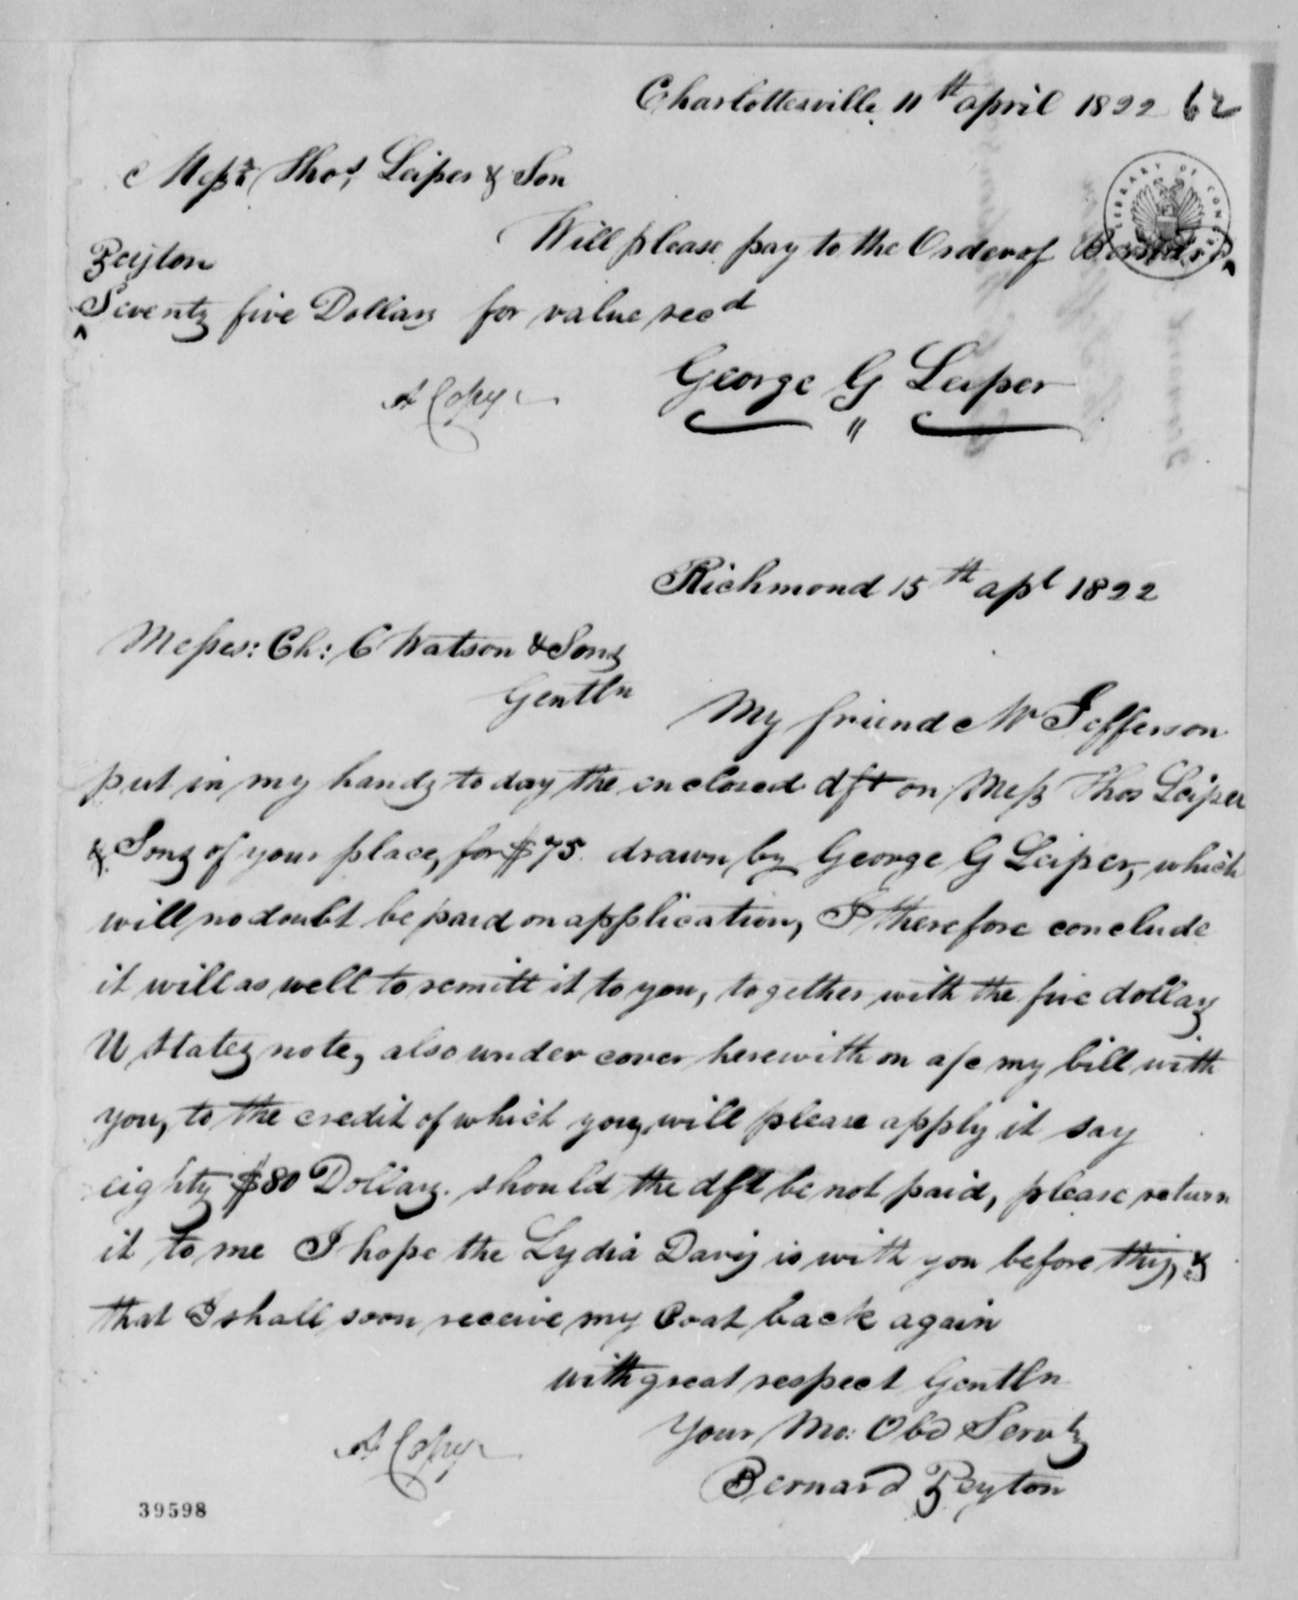 George G. Leiper to Thomas Leiper & Son, April 11, 1822, Payment